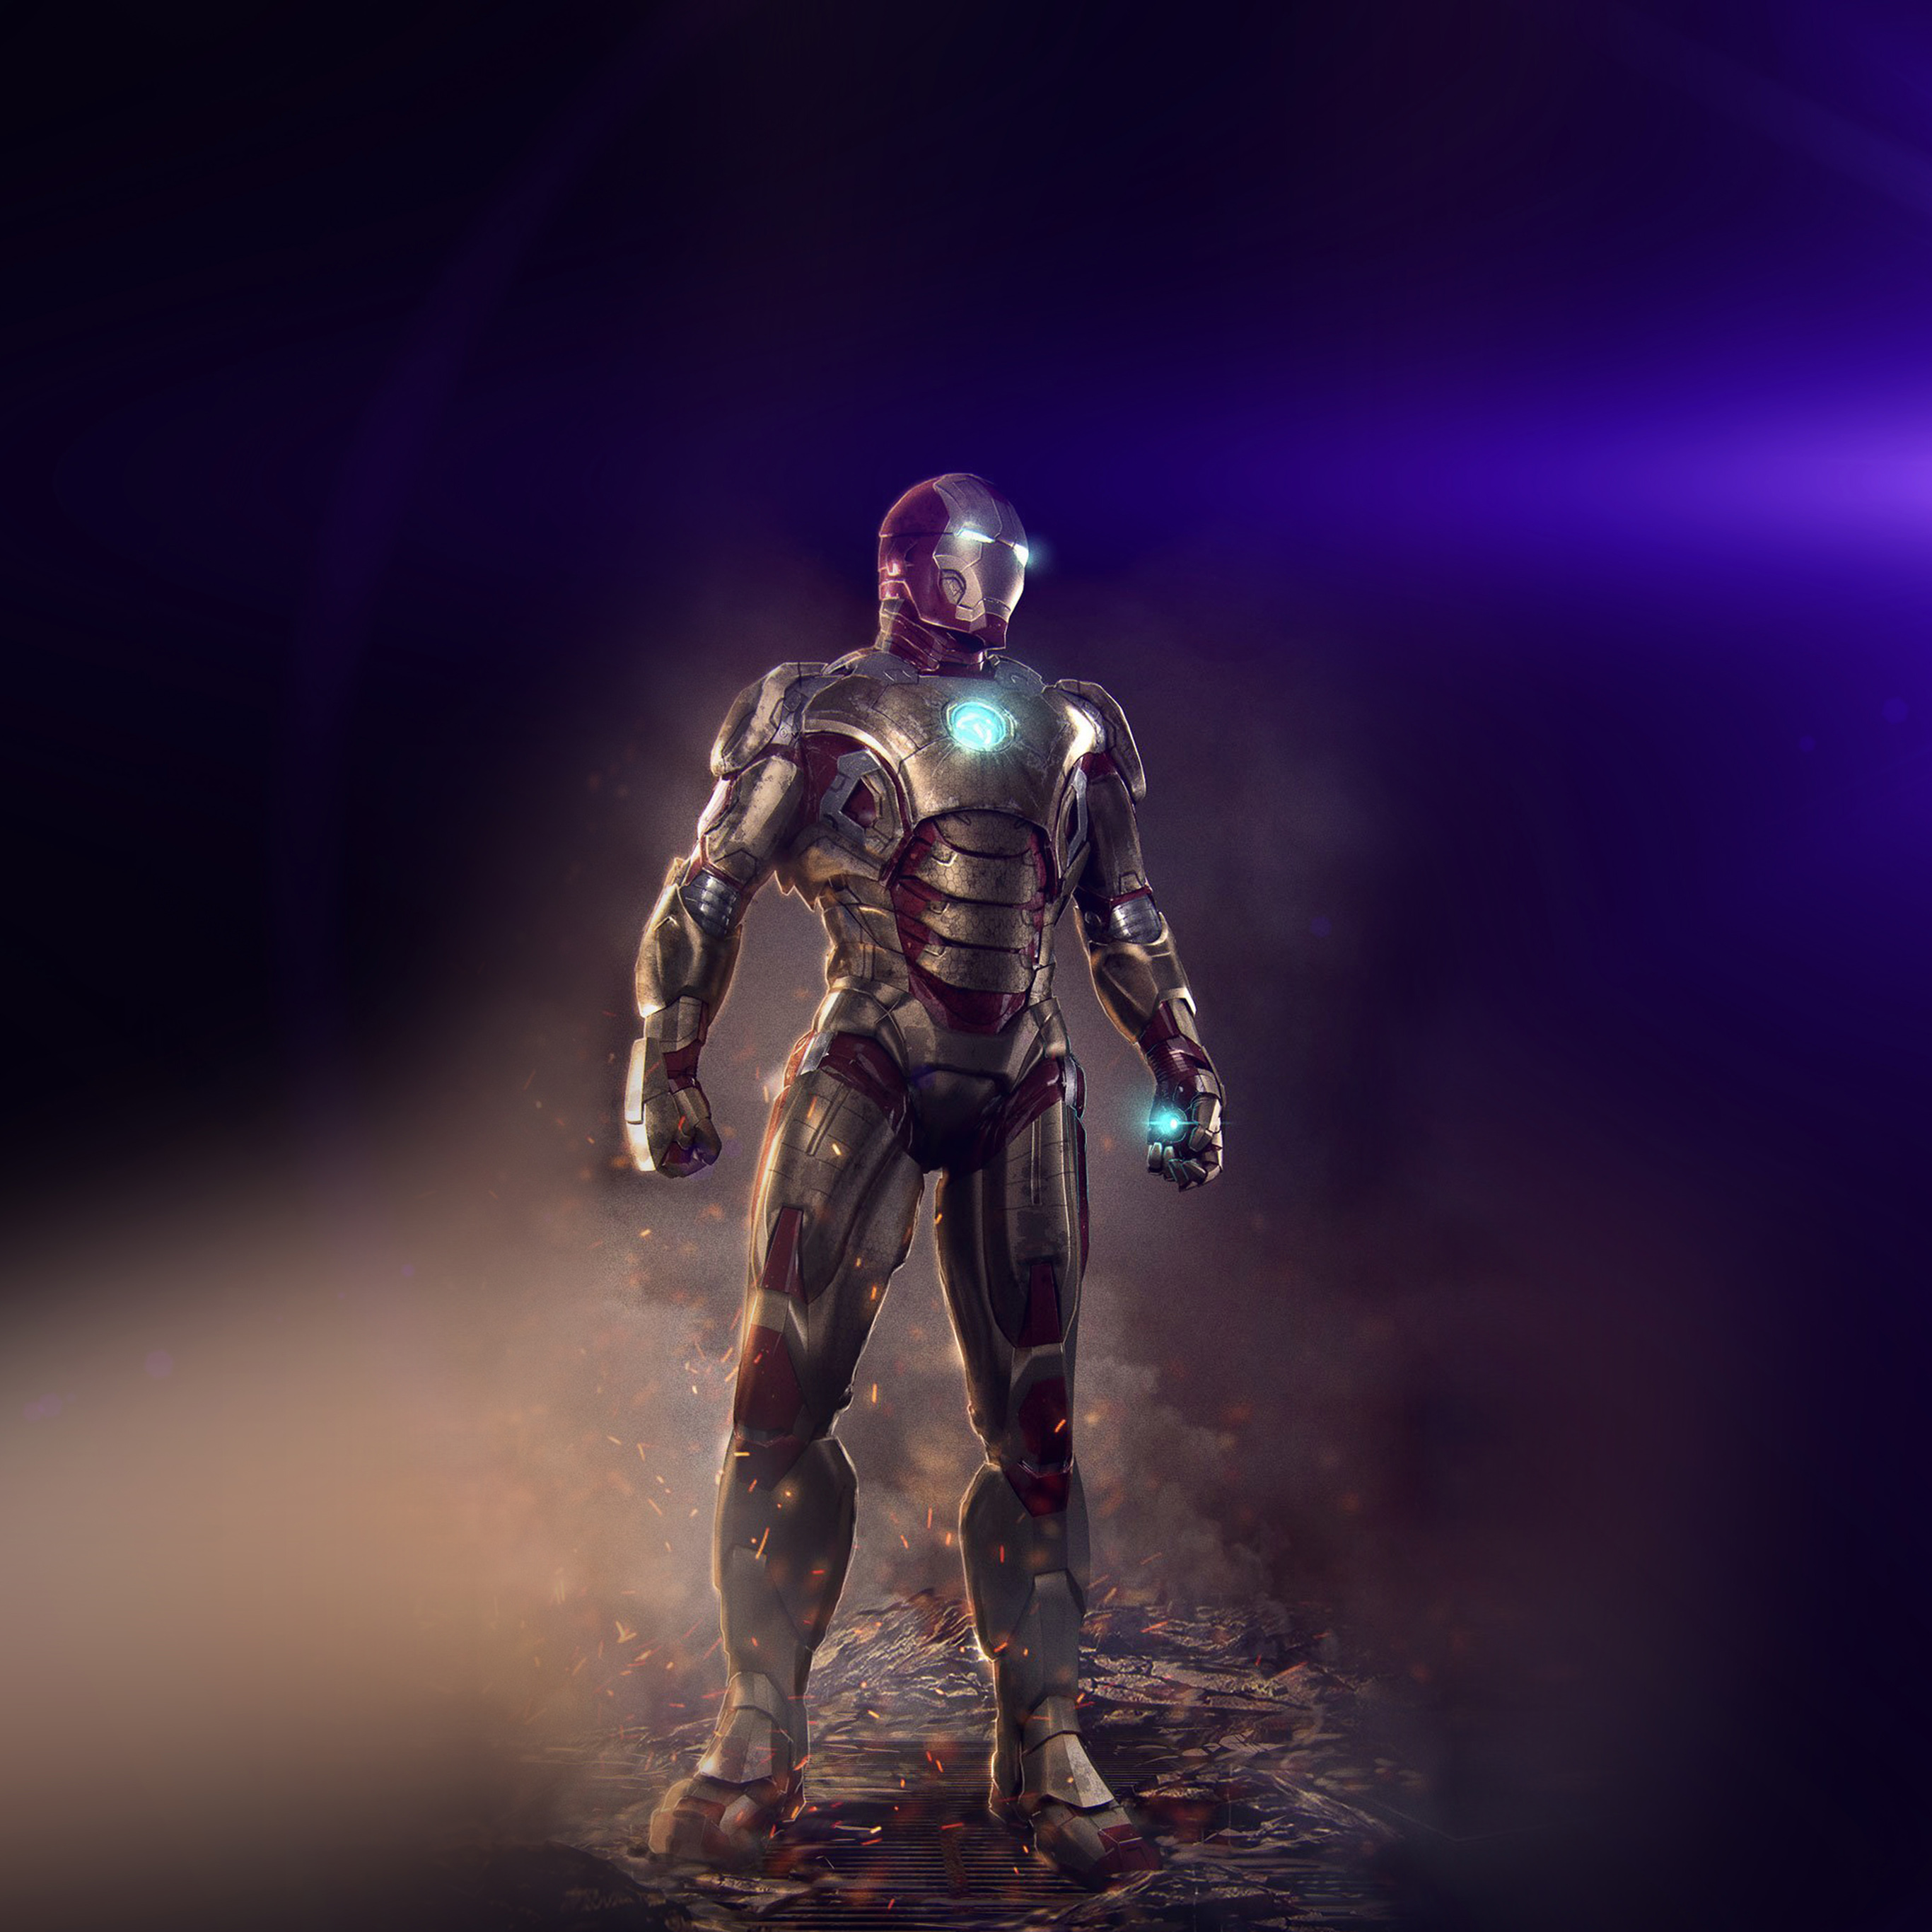 Wallpaper Iphone Superhero: An14-ironman-hero-marvel-art-illust-flare-wallpaper